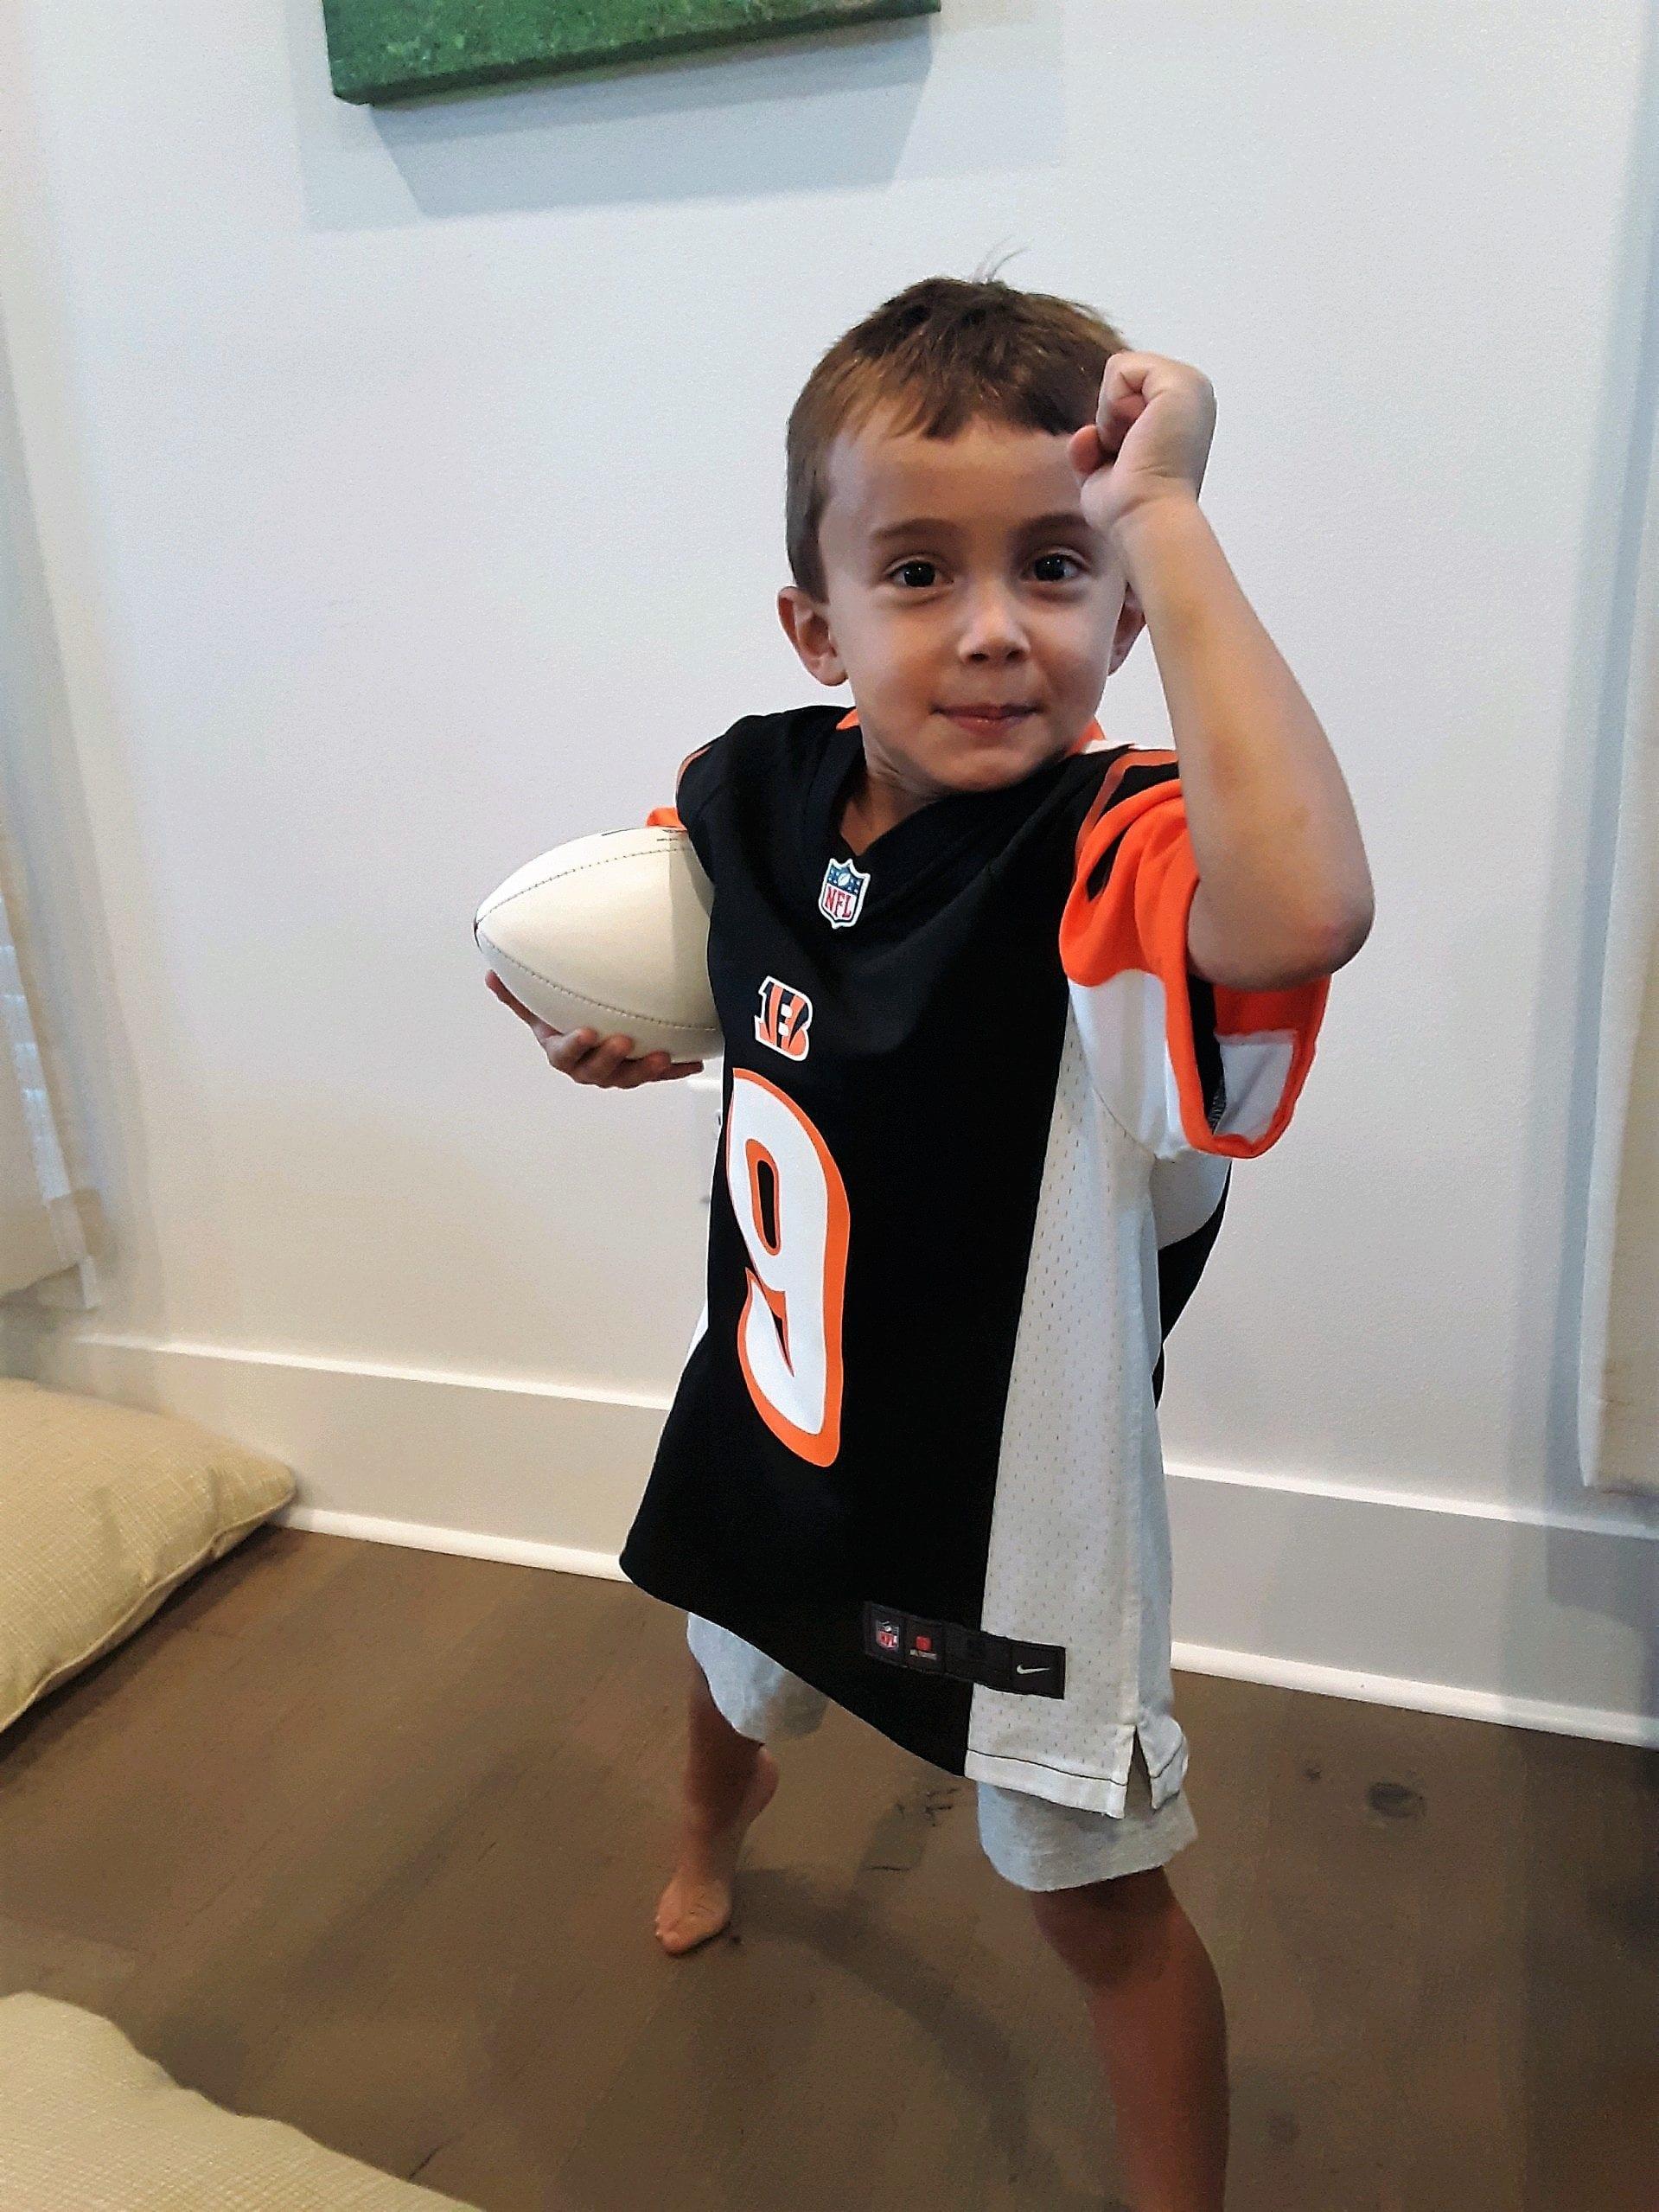 little boy in Bengals jersey